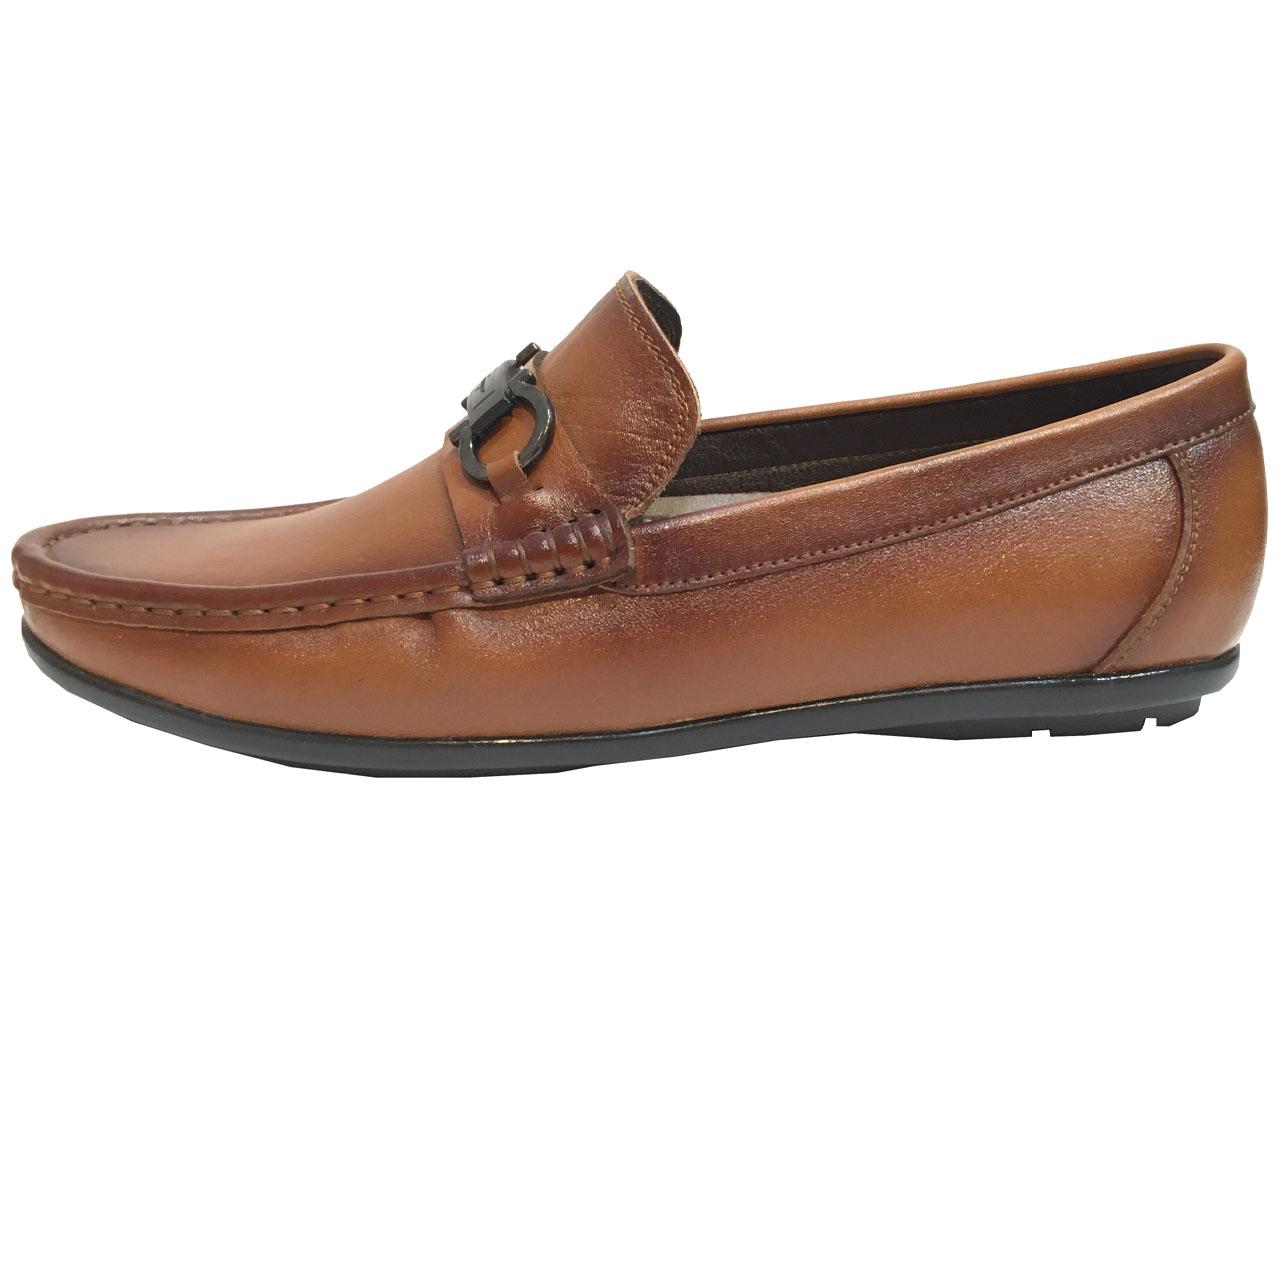 کفش روزمره مردانه مدل ec کد f 11